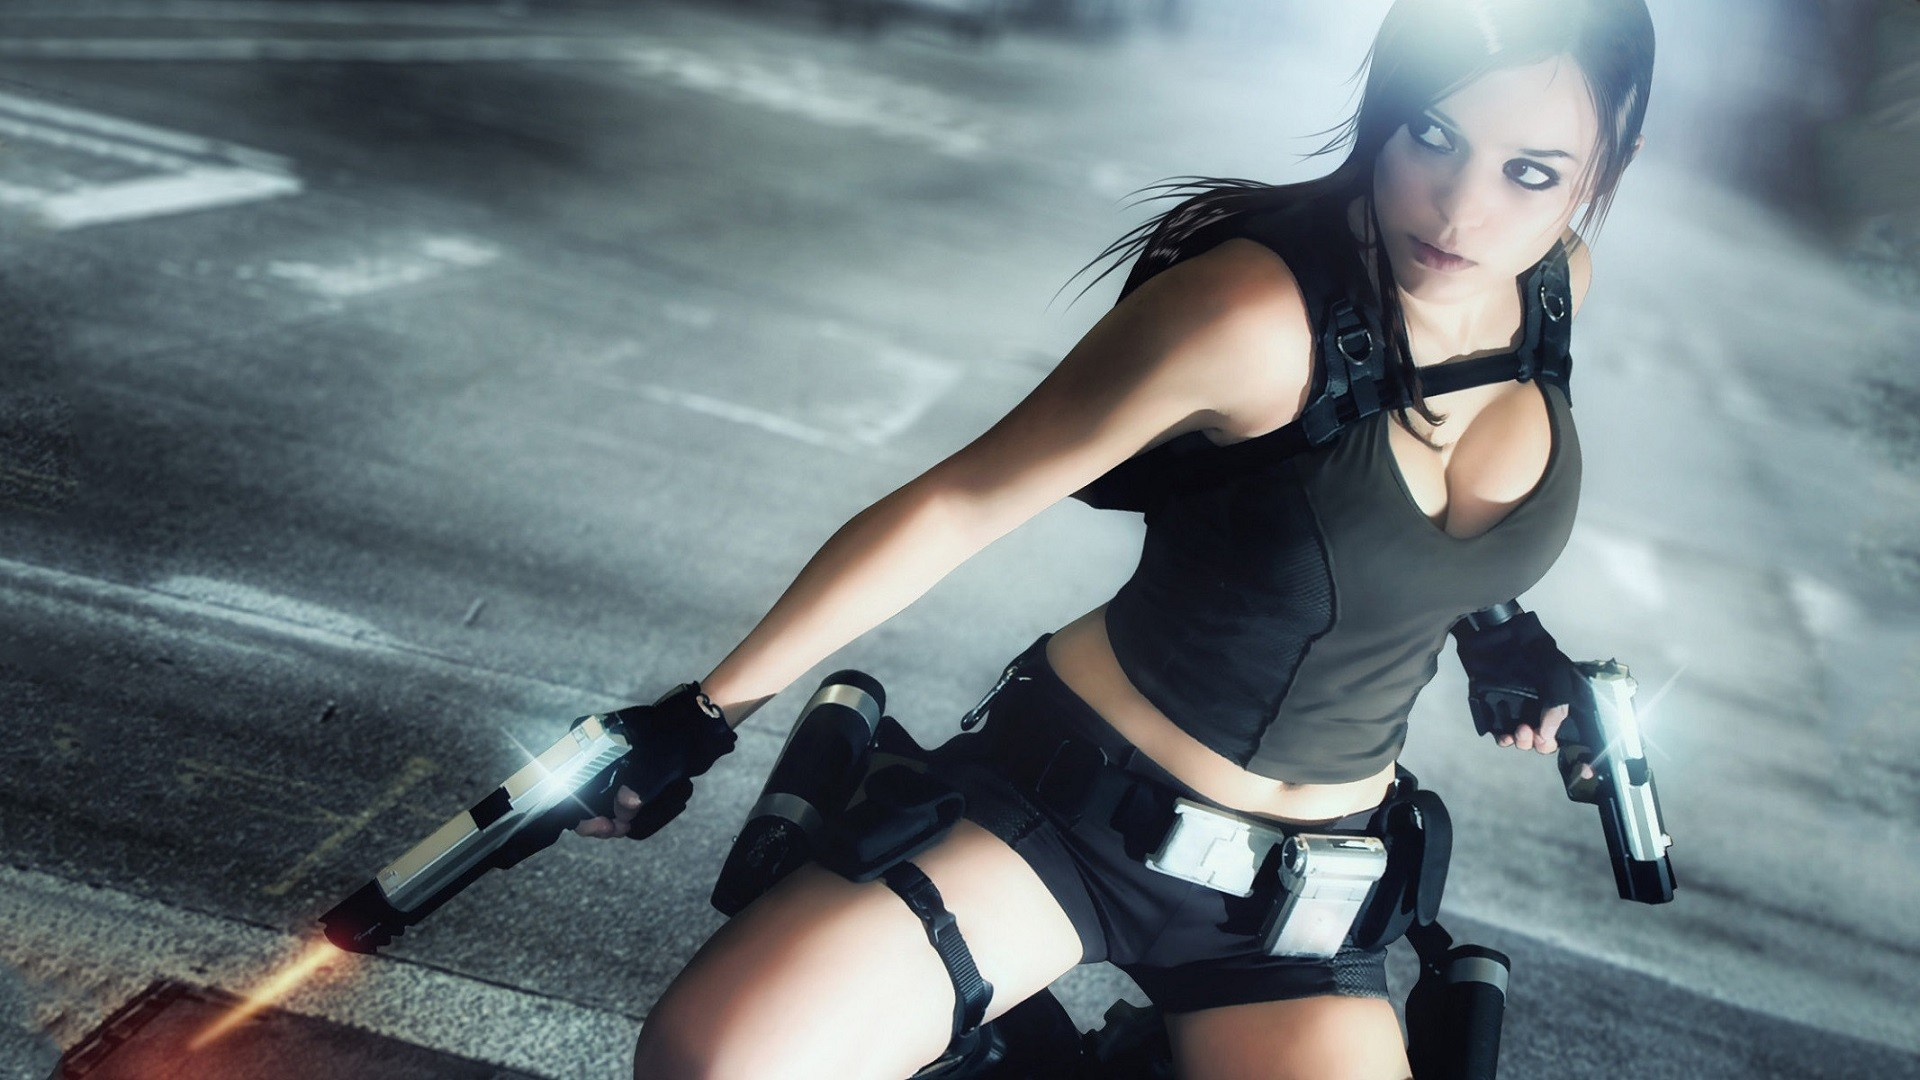 Lara Croft Tomb Raider Cosplay Handgun Brunette Cleavage